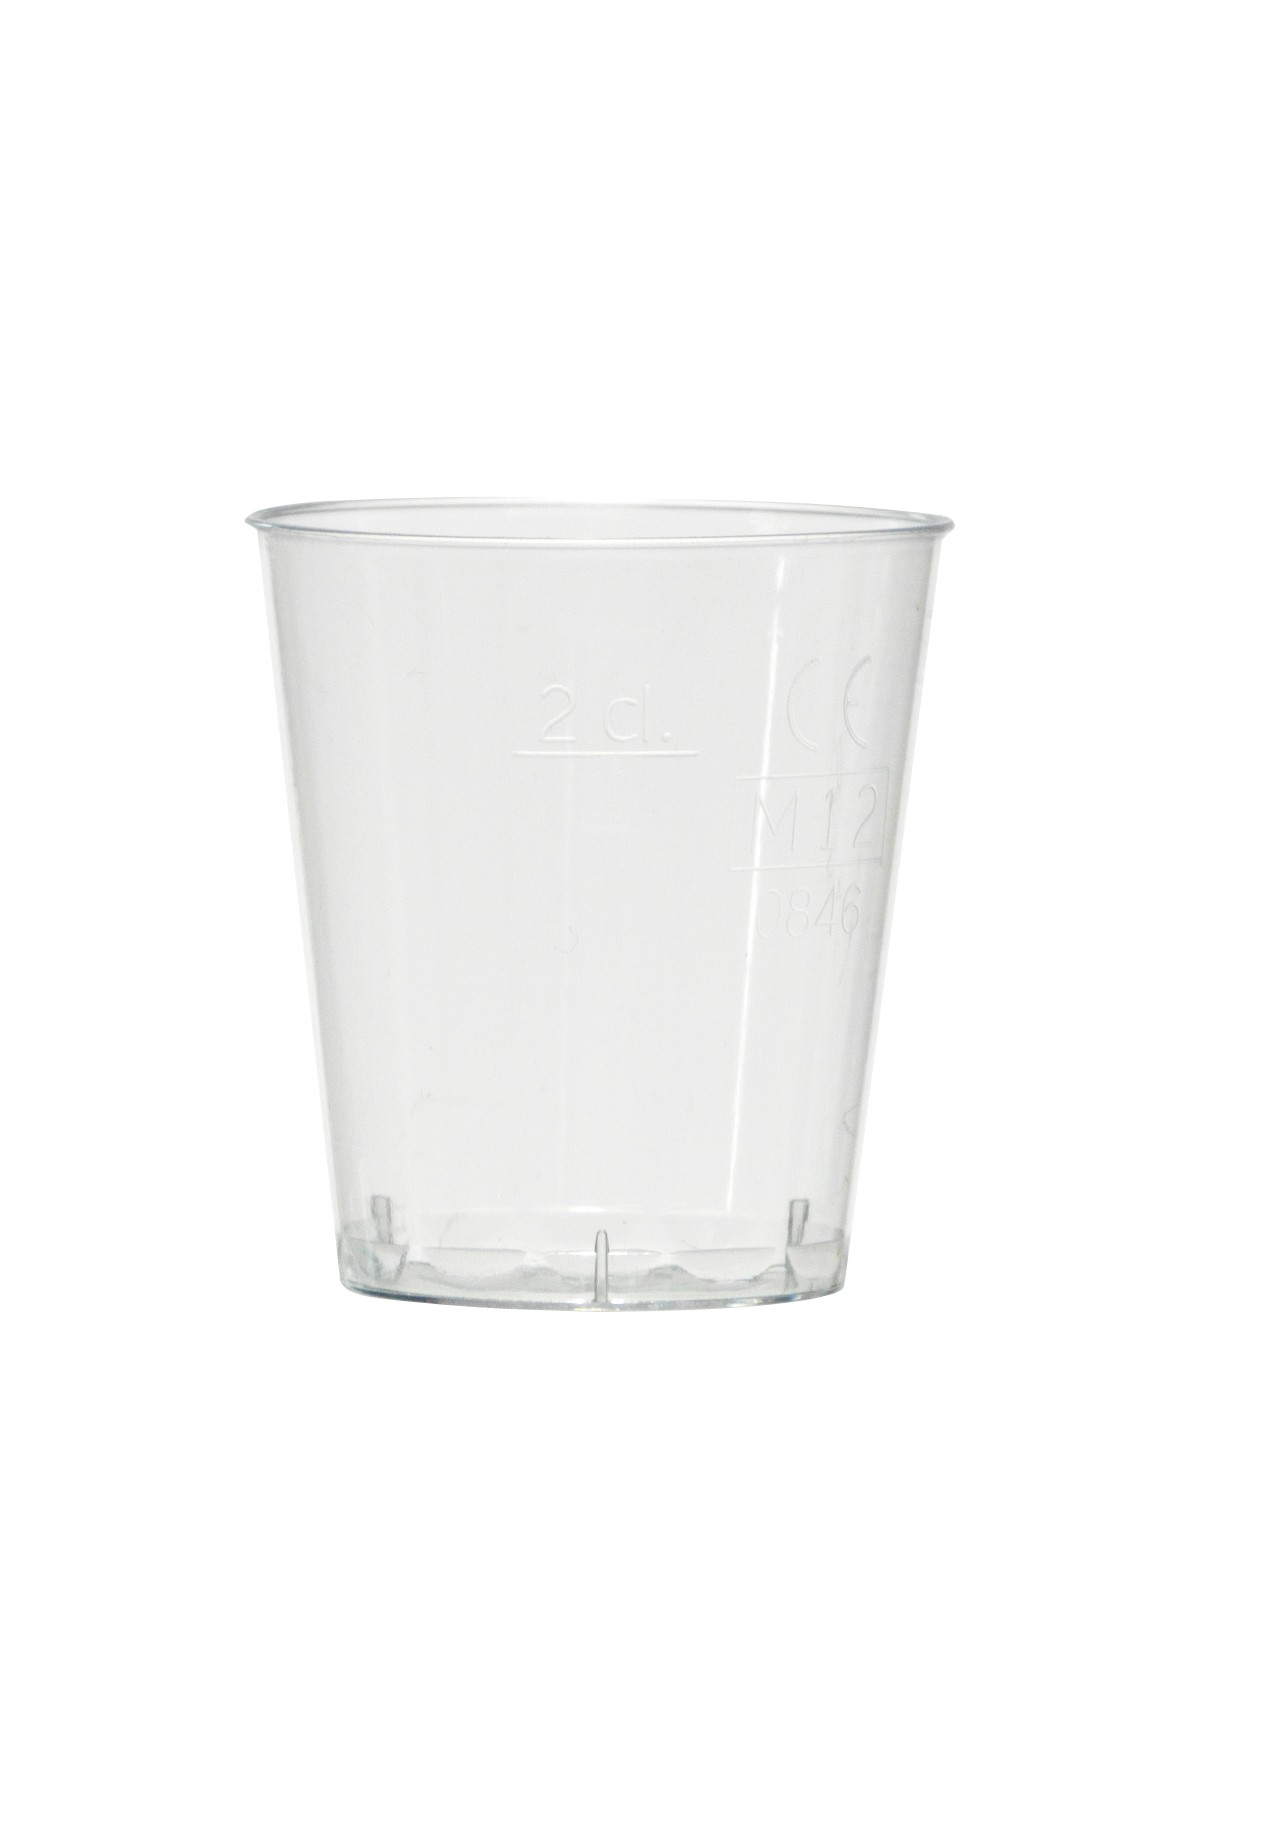 VERRINE PLASTIQUE PAS CHER 3cl